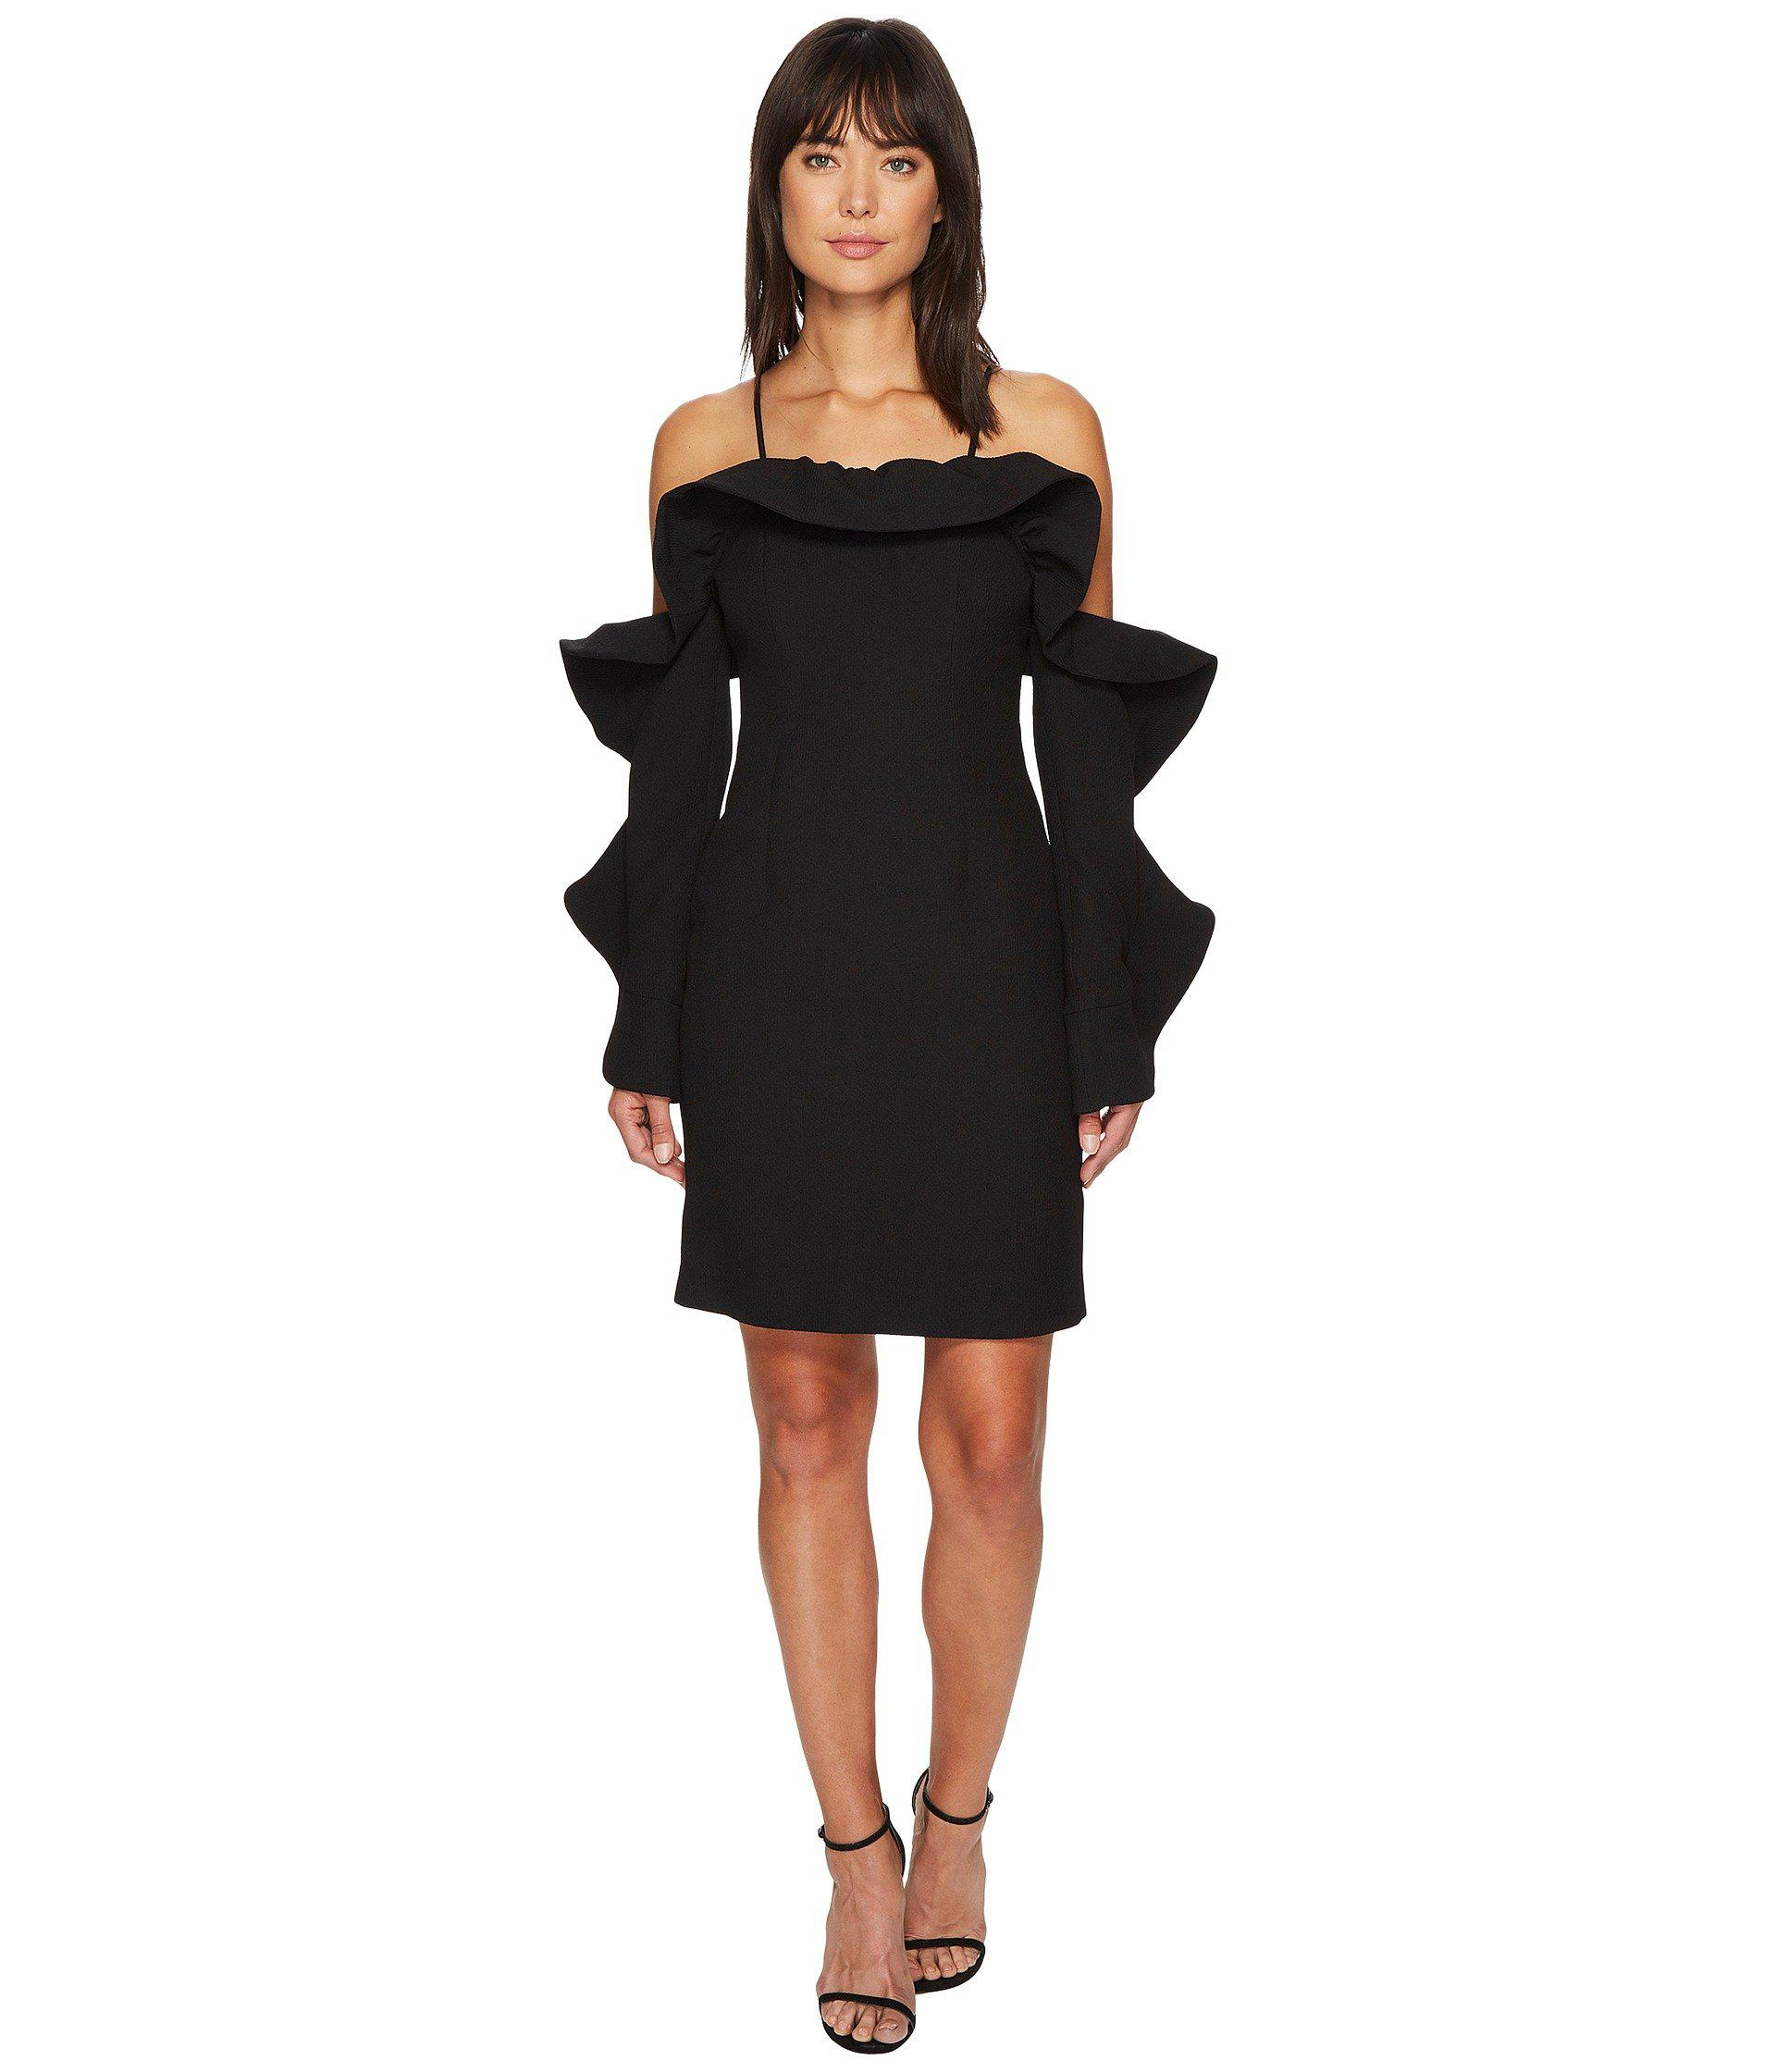 Lyst - Keepsake Messages Long Sleeve Mini Dress in Black - Save 50%